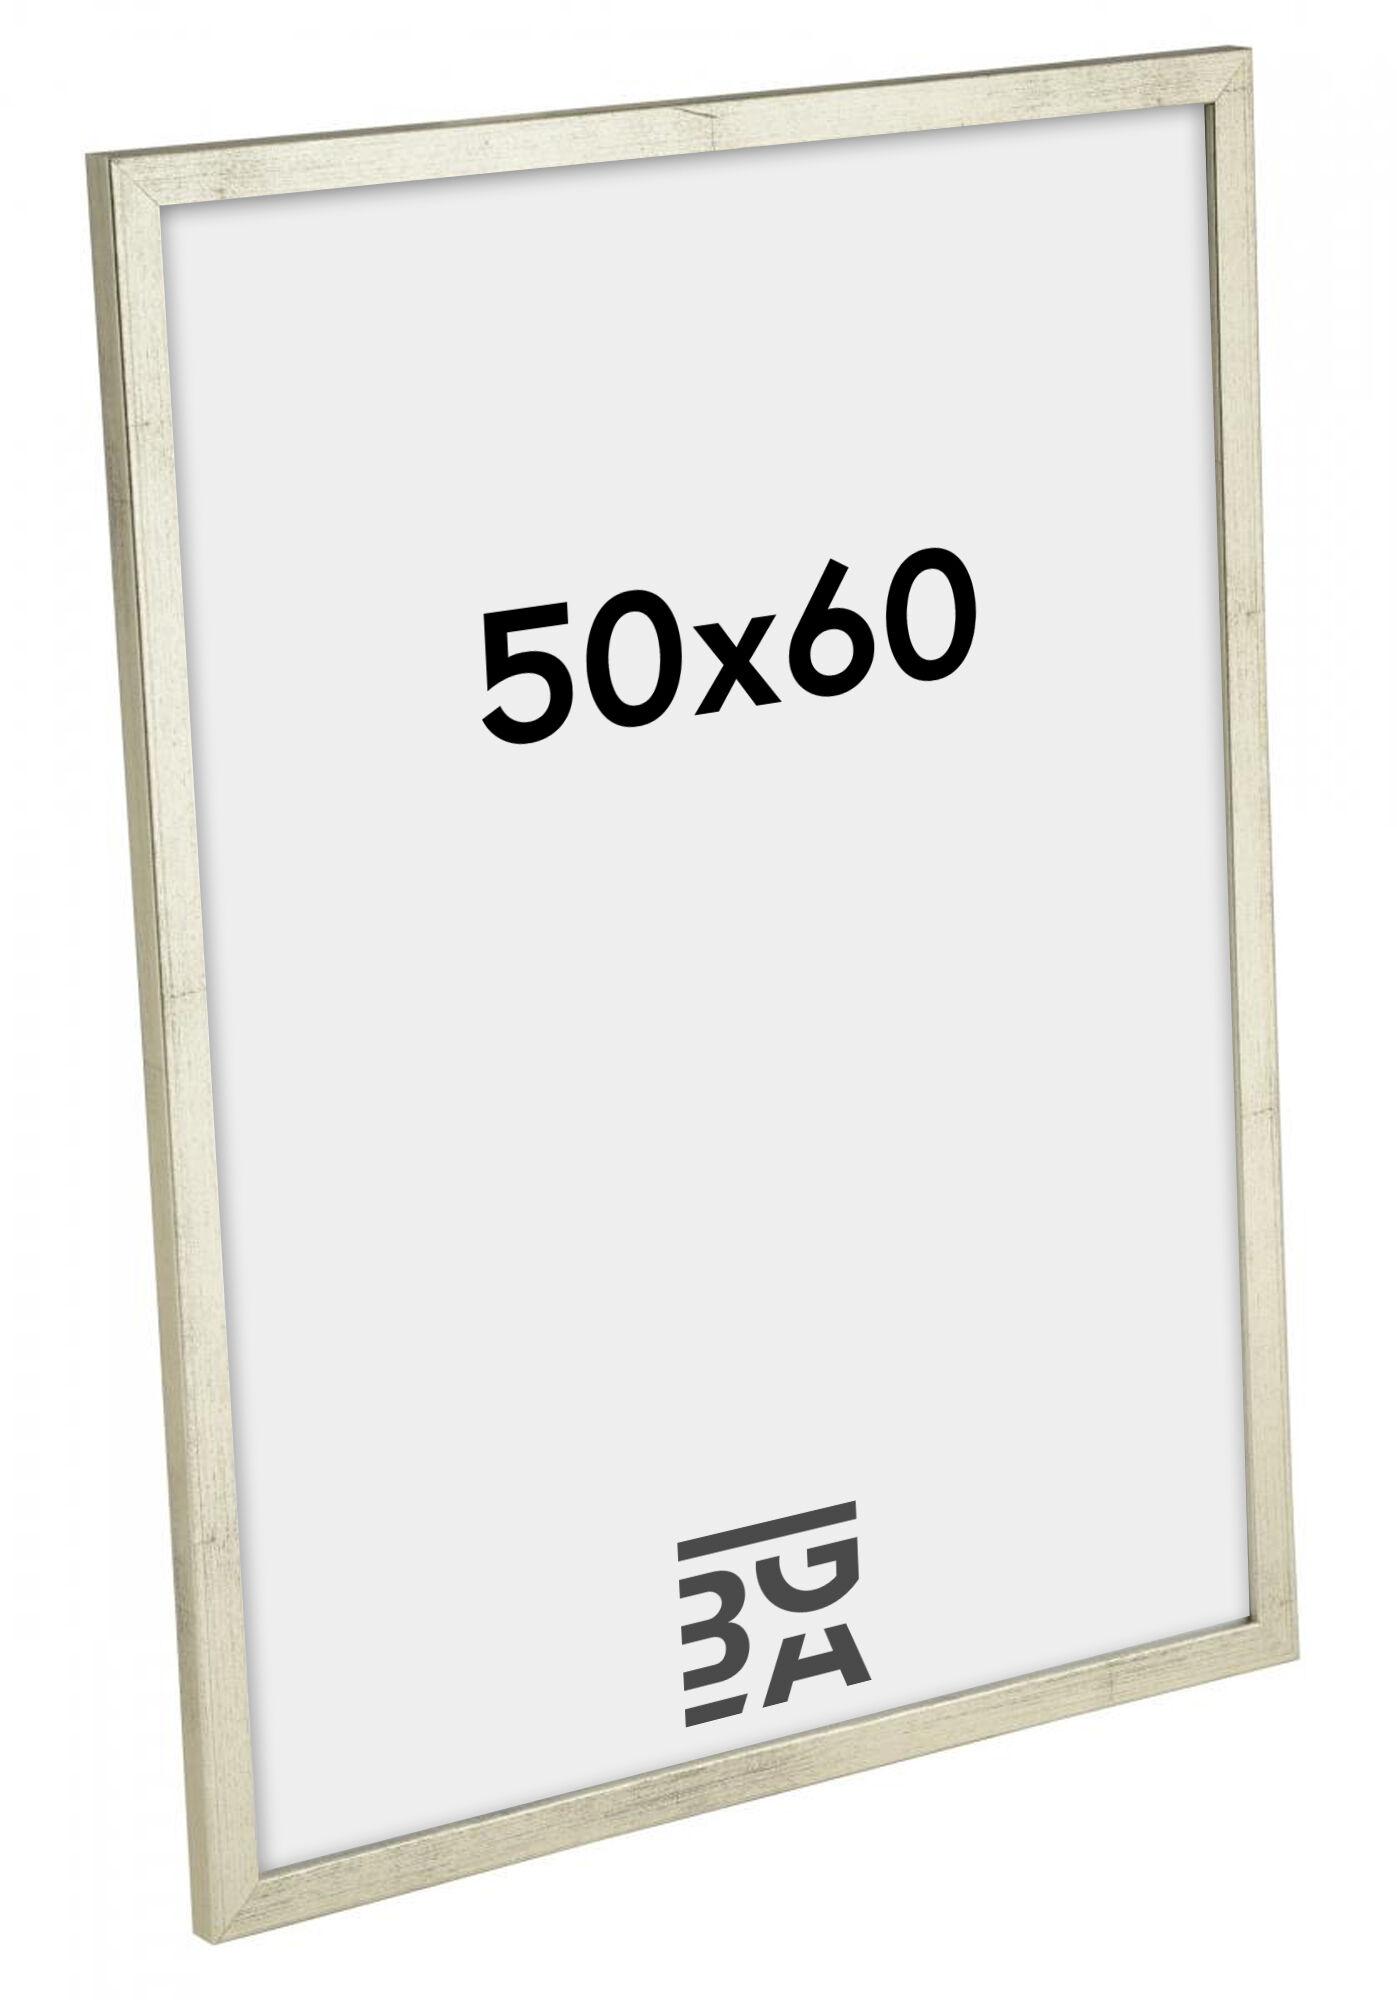 Estancia Galant Hopeanvärinen 50x60 cm